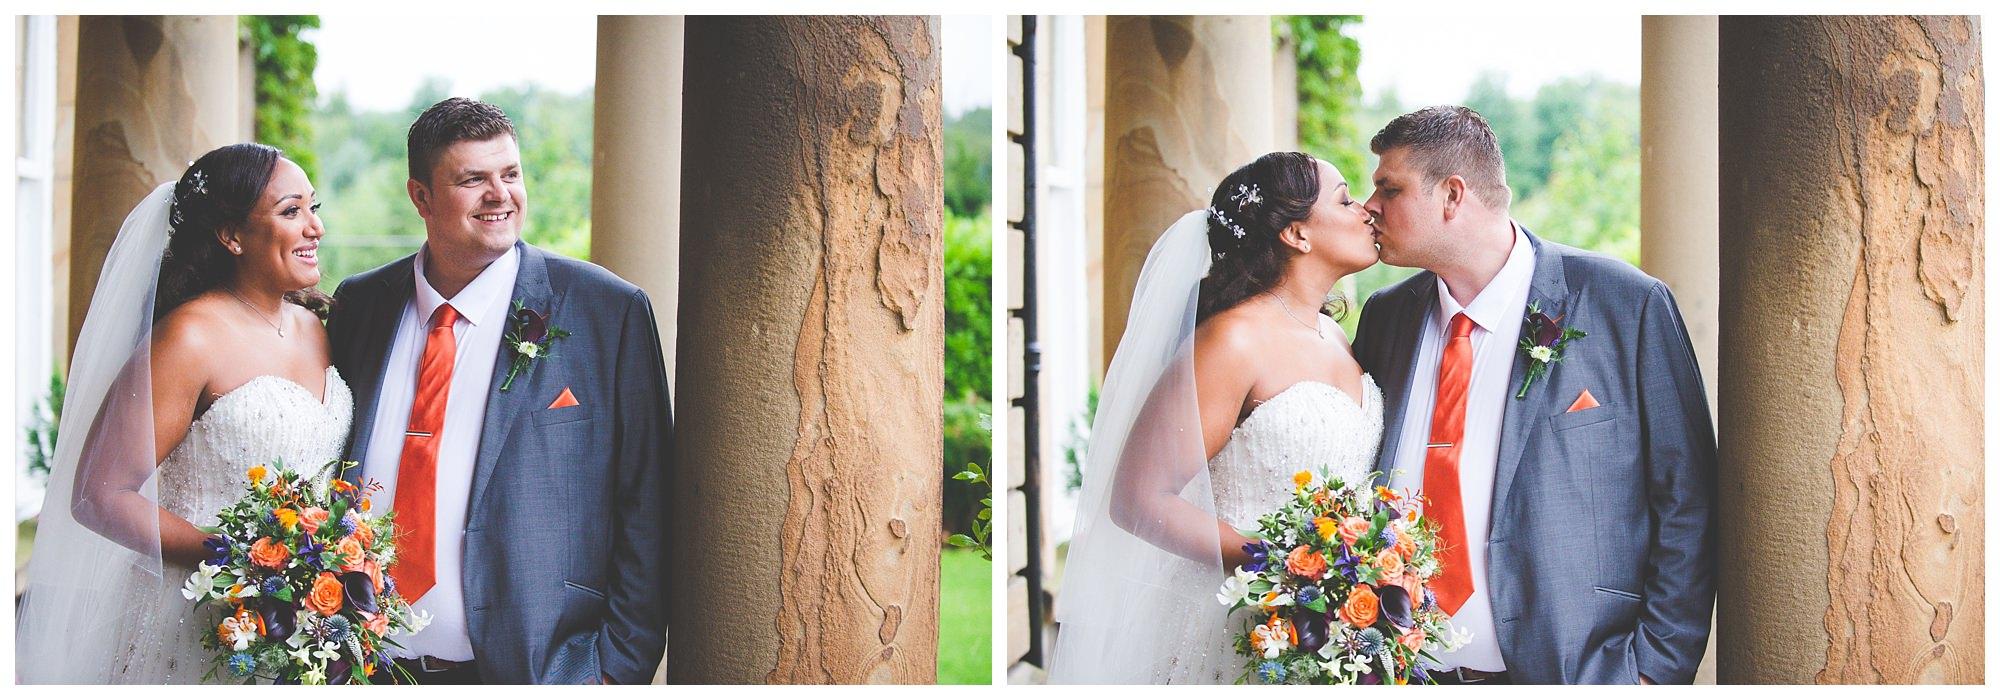 Walton-Hall-Wedding-Photography_0047